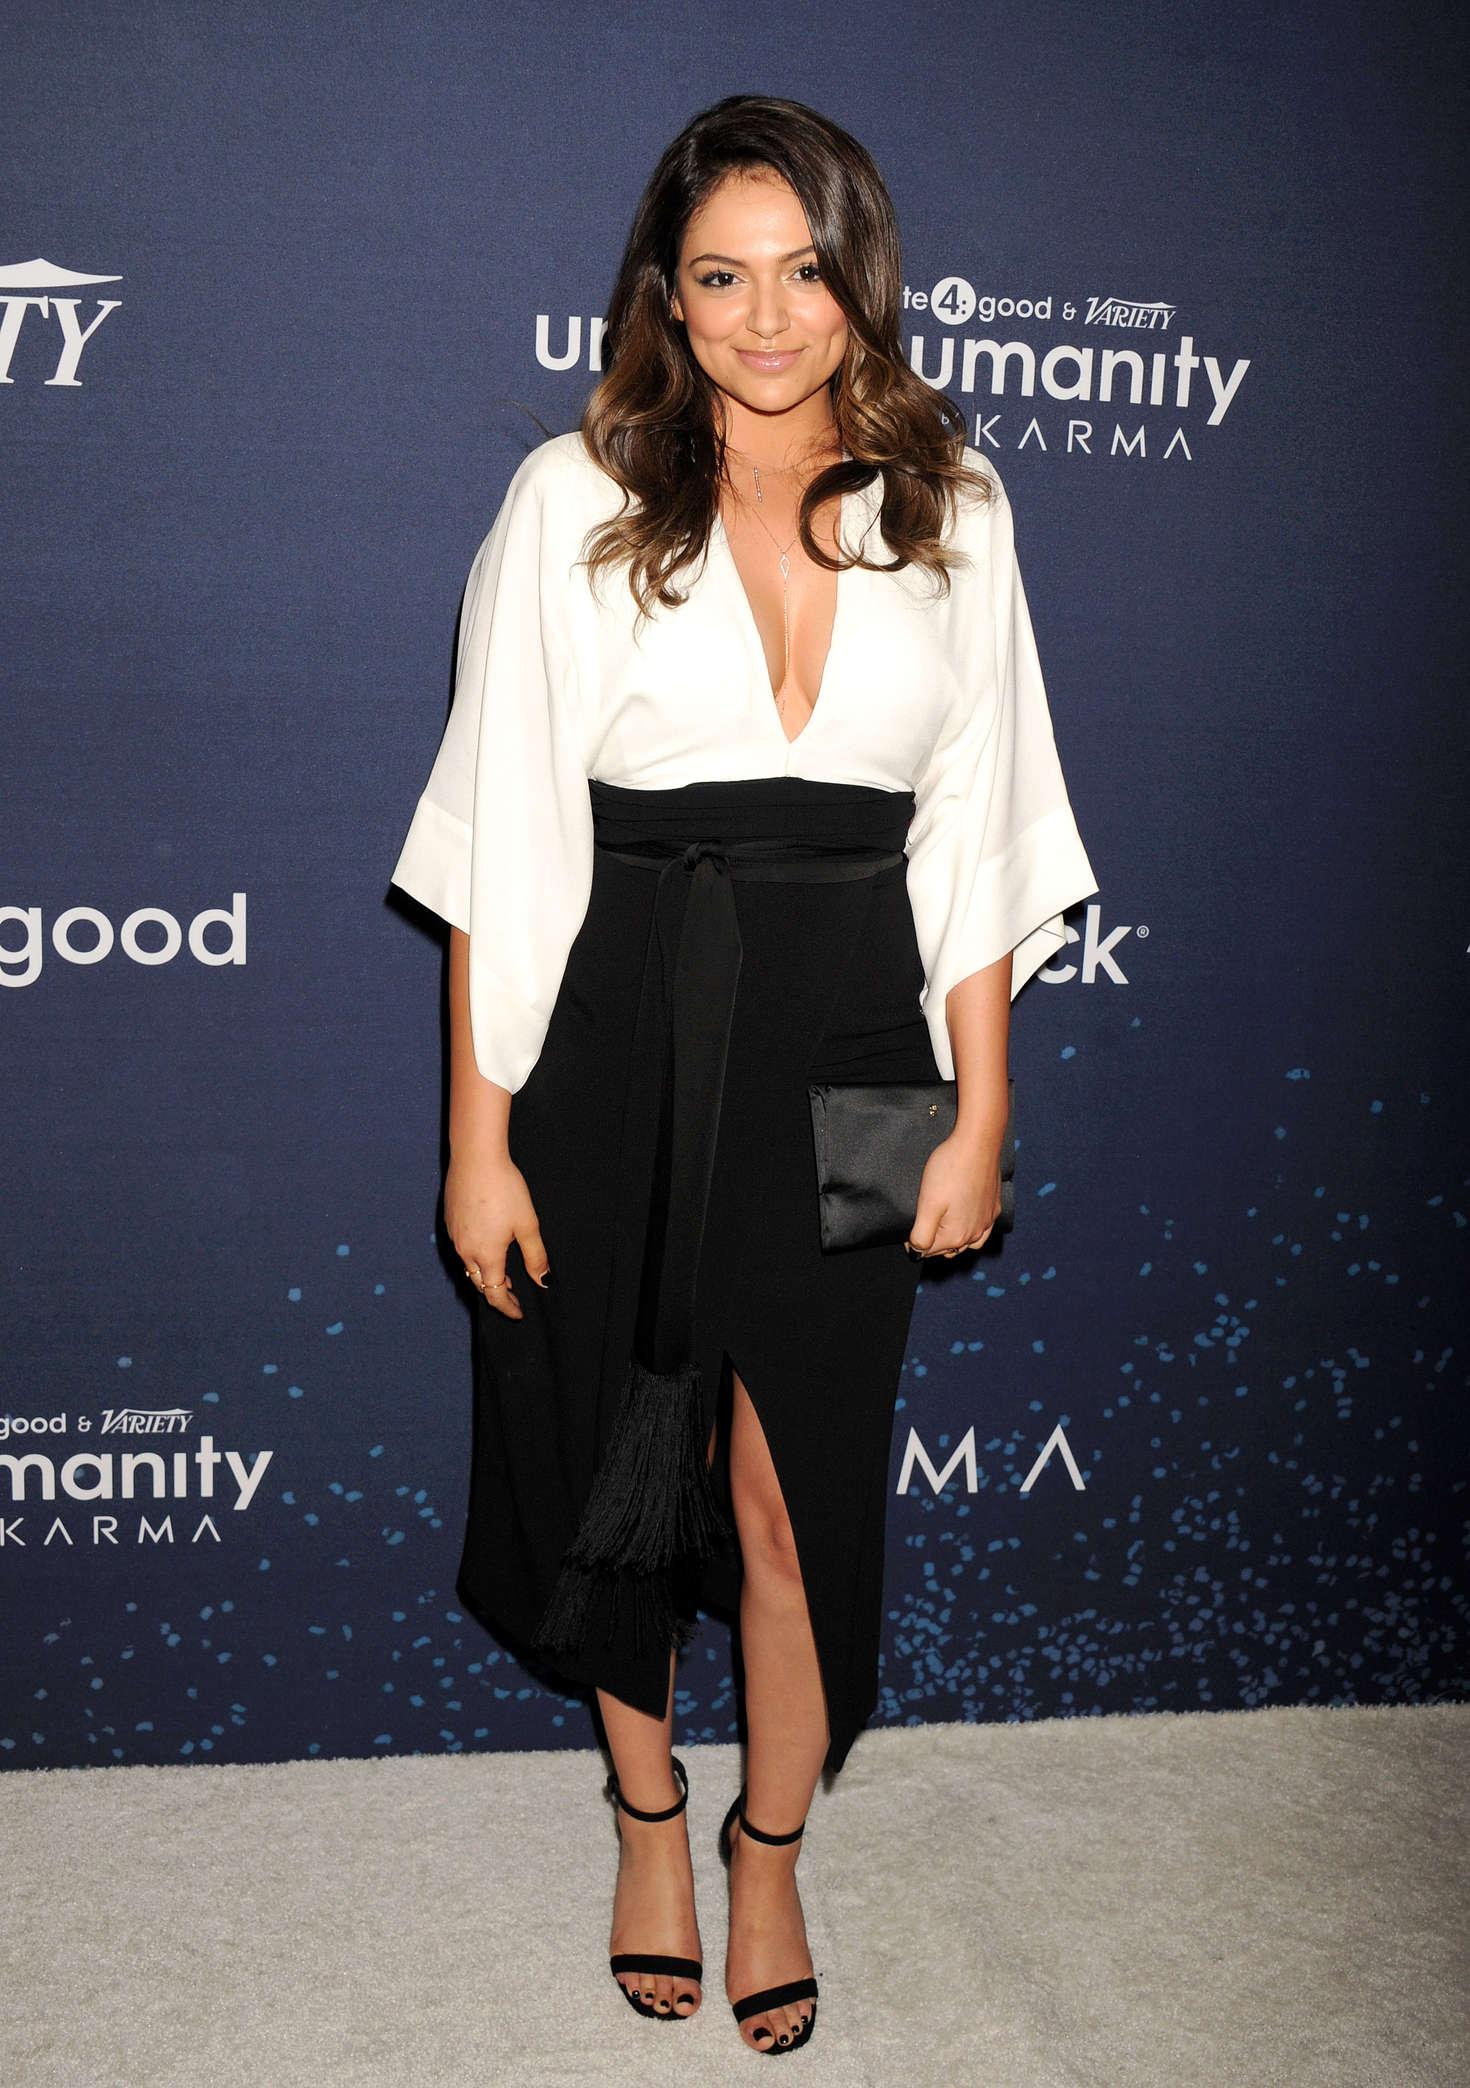 Bethany Mota Annual Unite4Humanity Gala in Beverly Hills